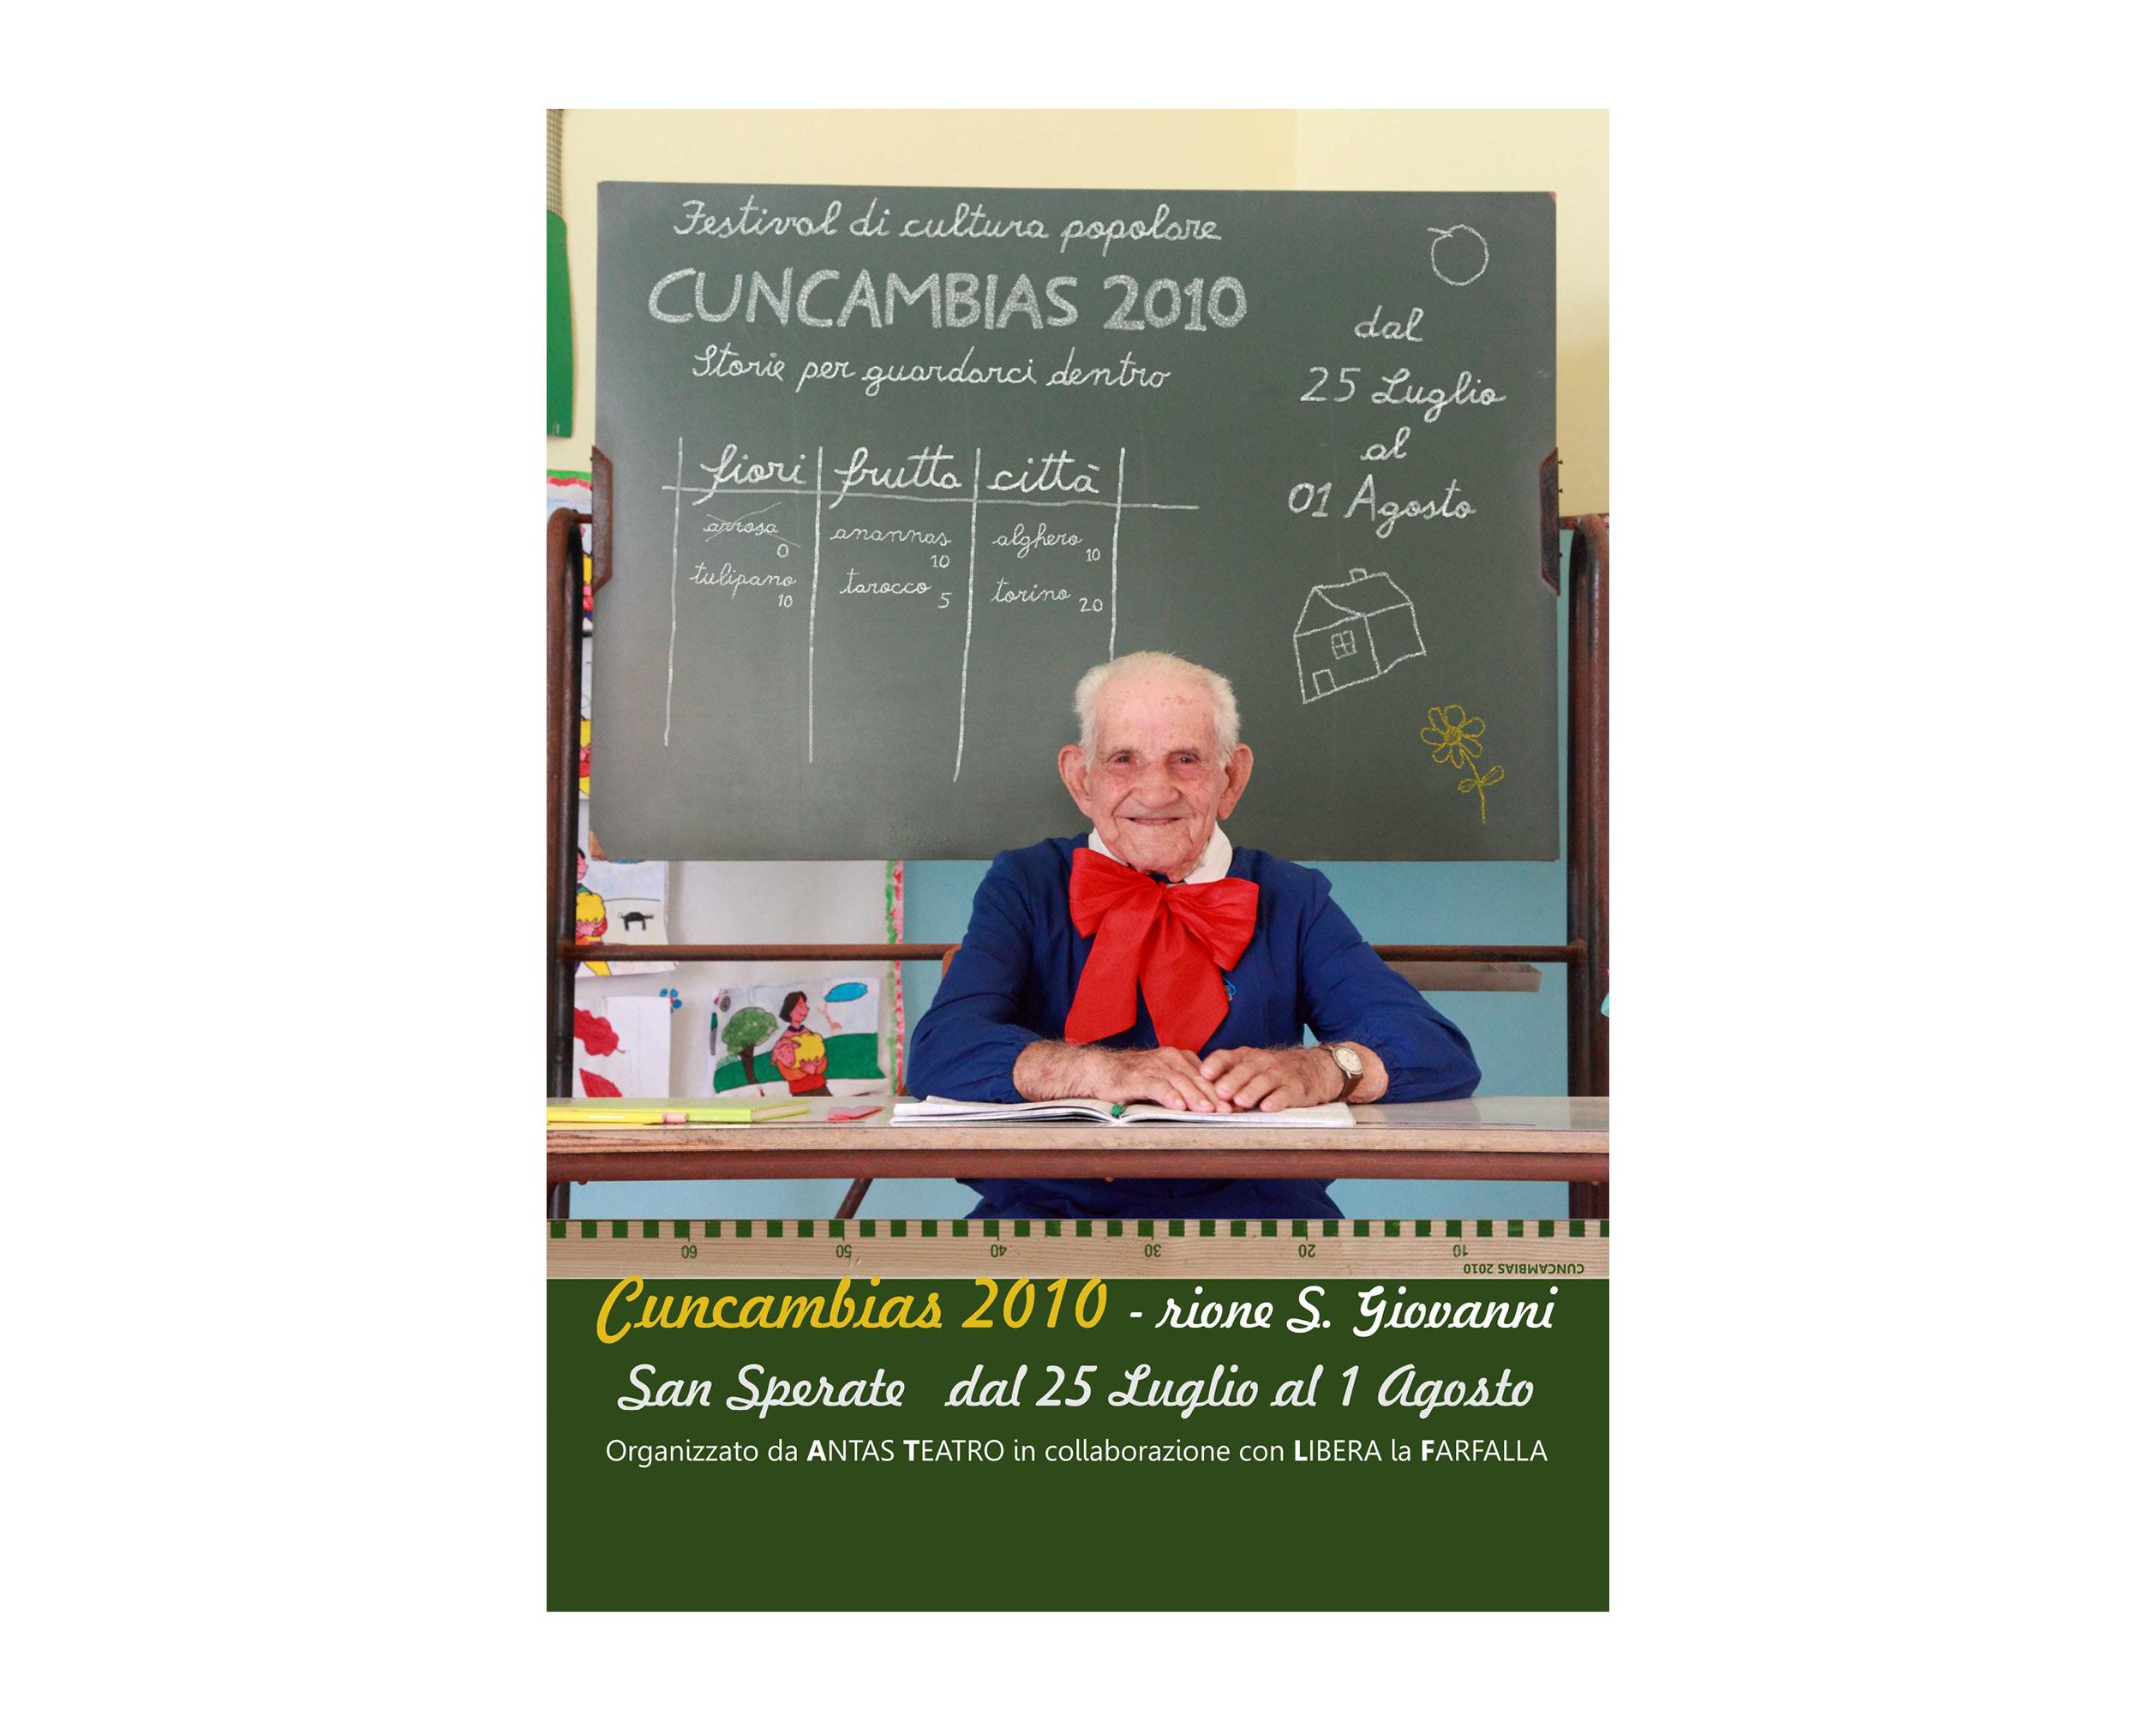 Cuncambias 2010